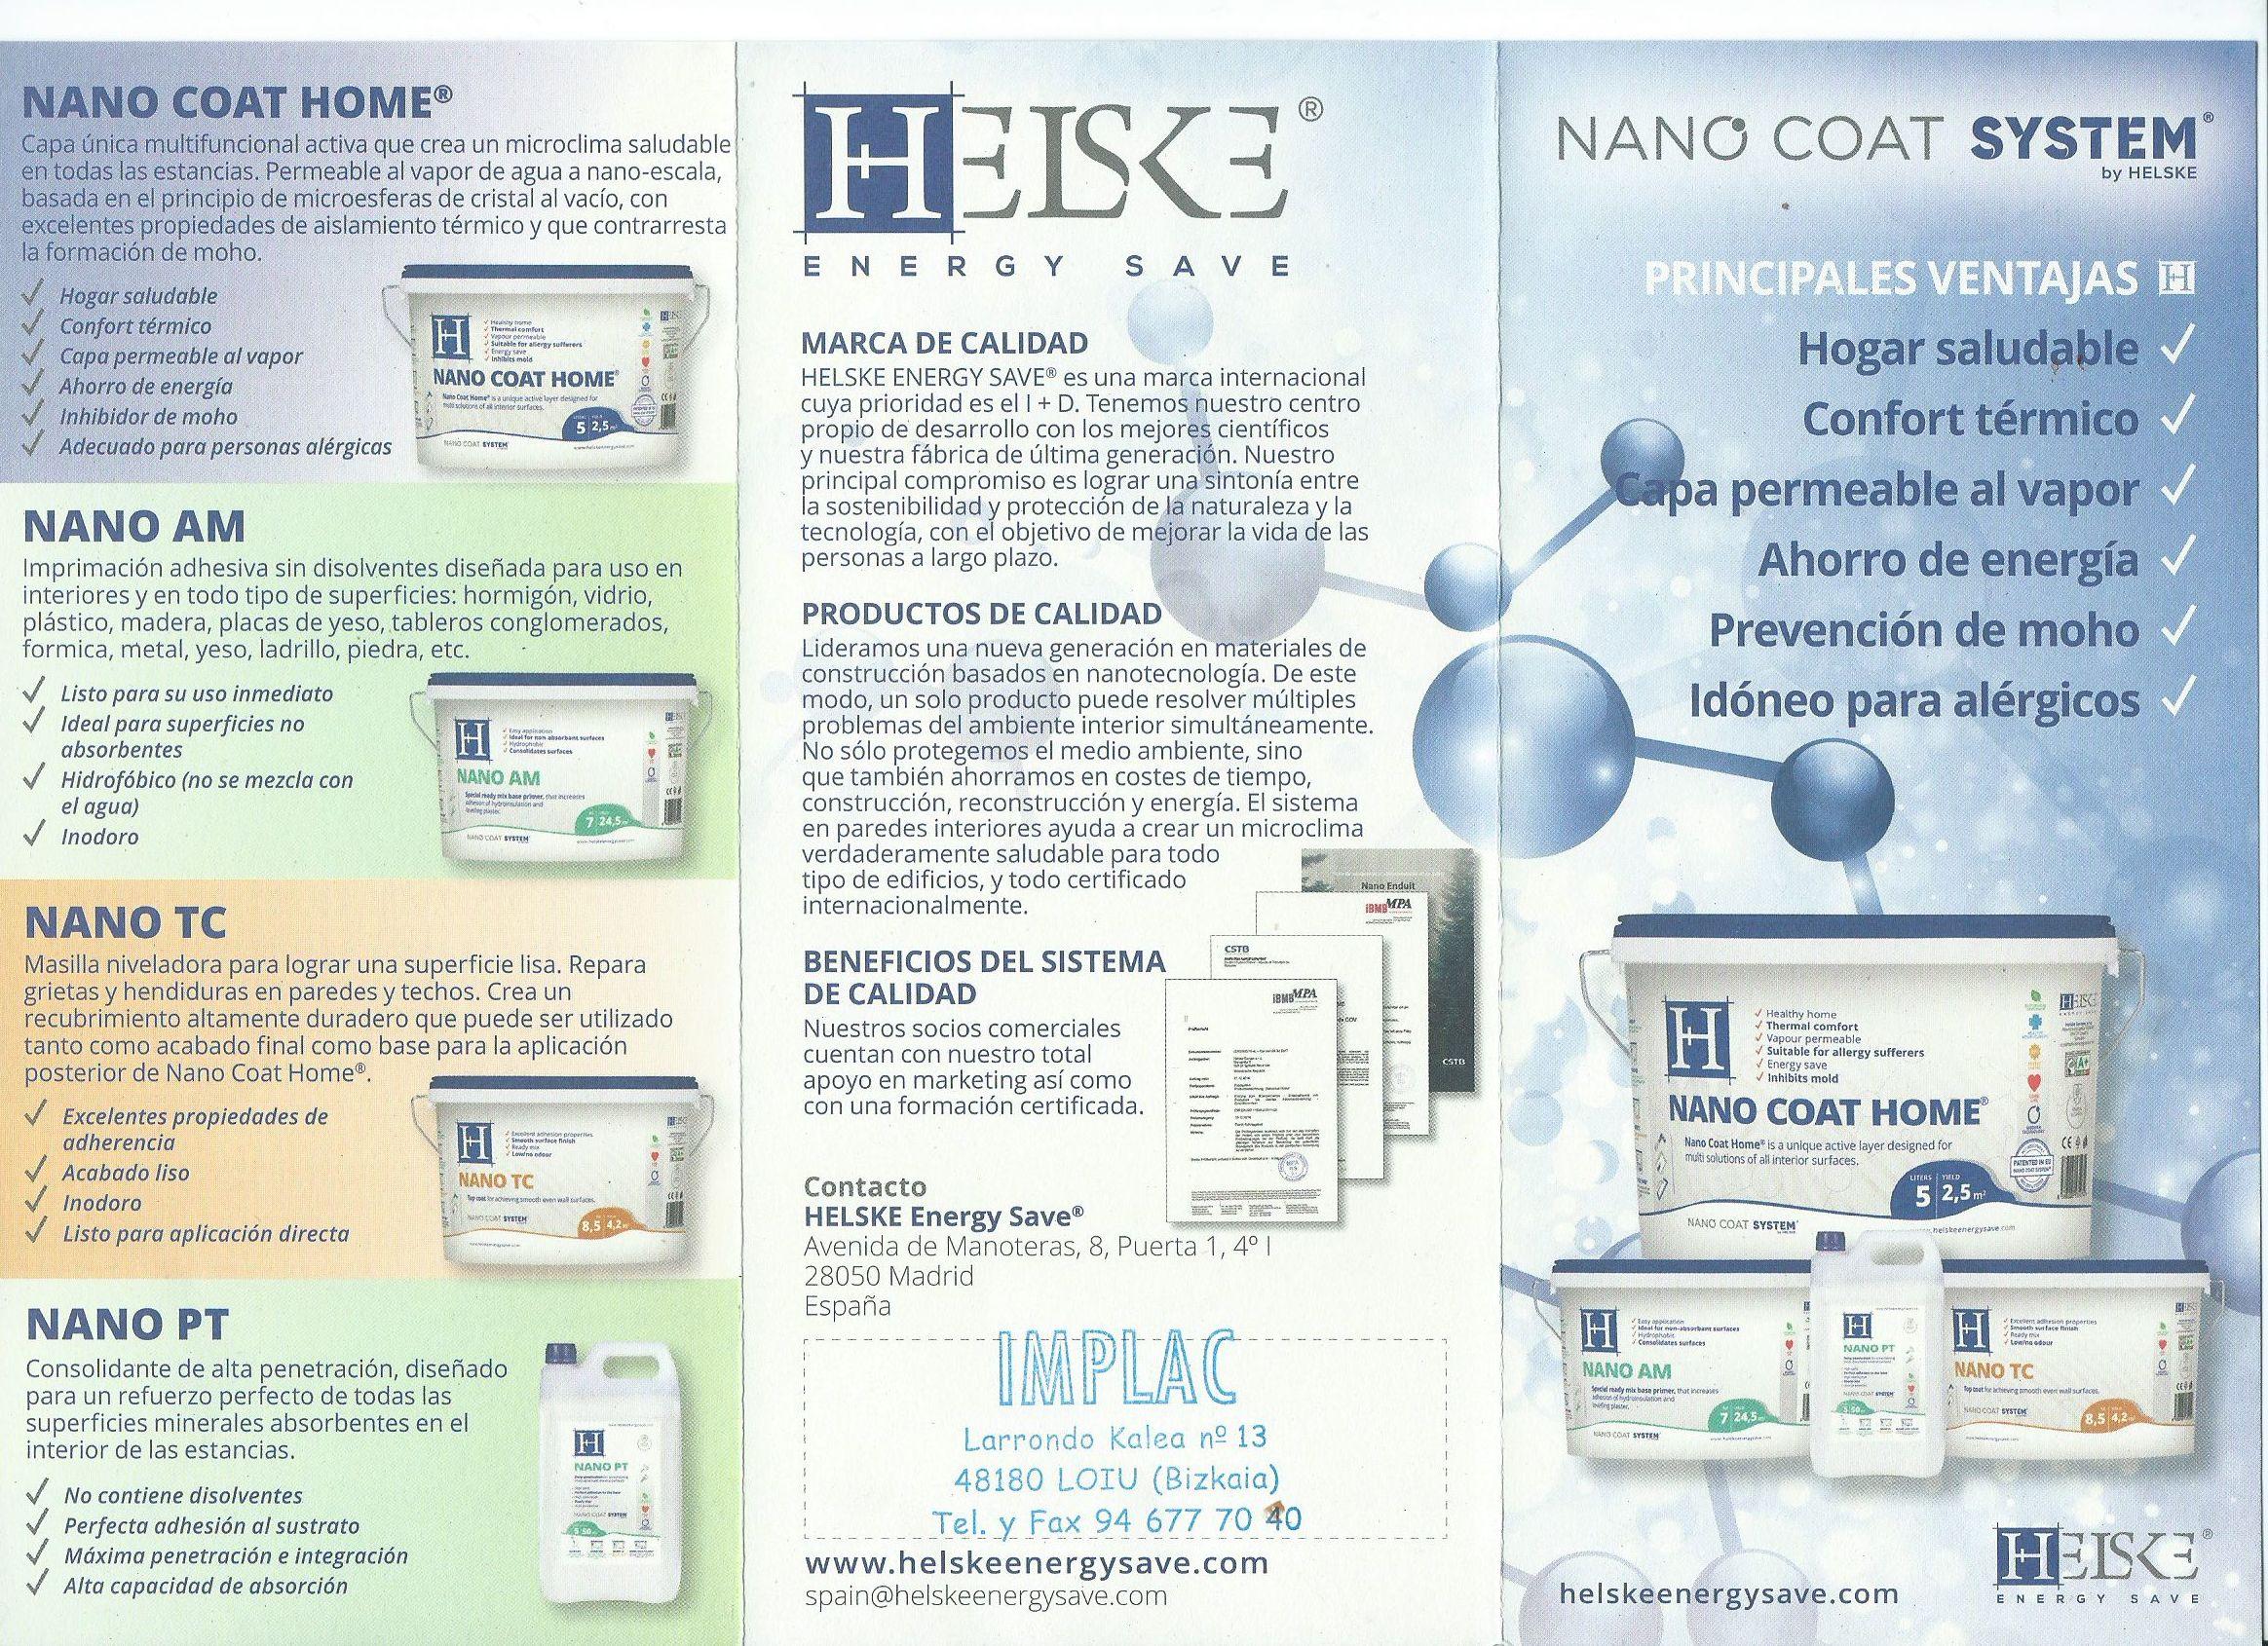 Nano Coat System